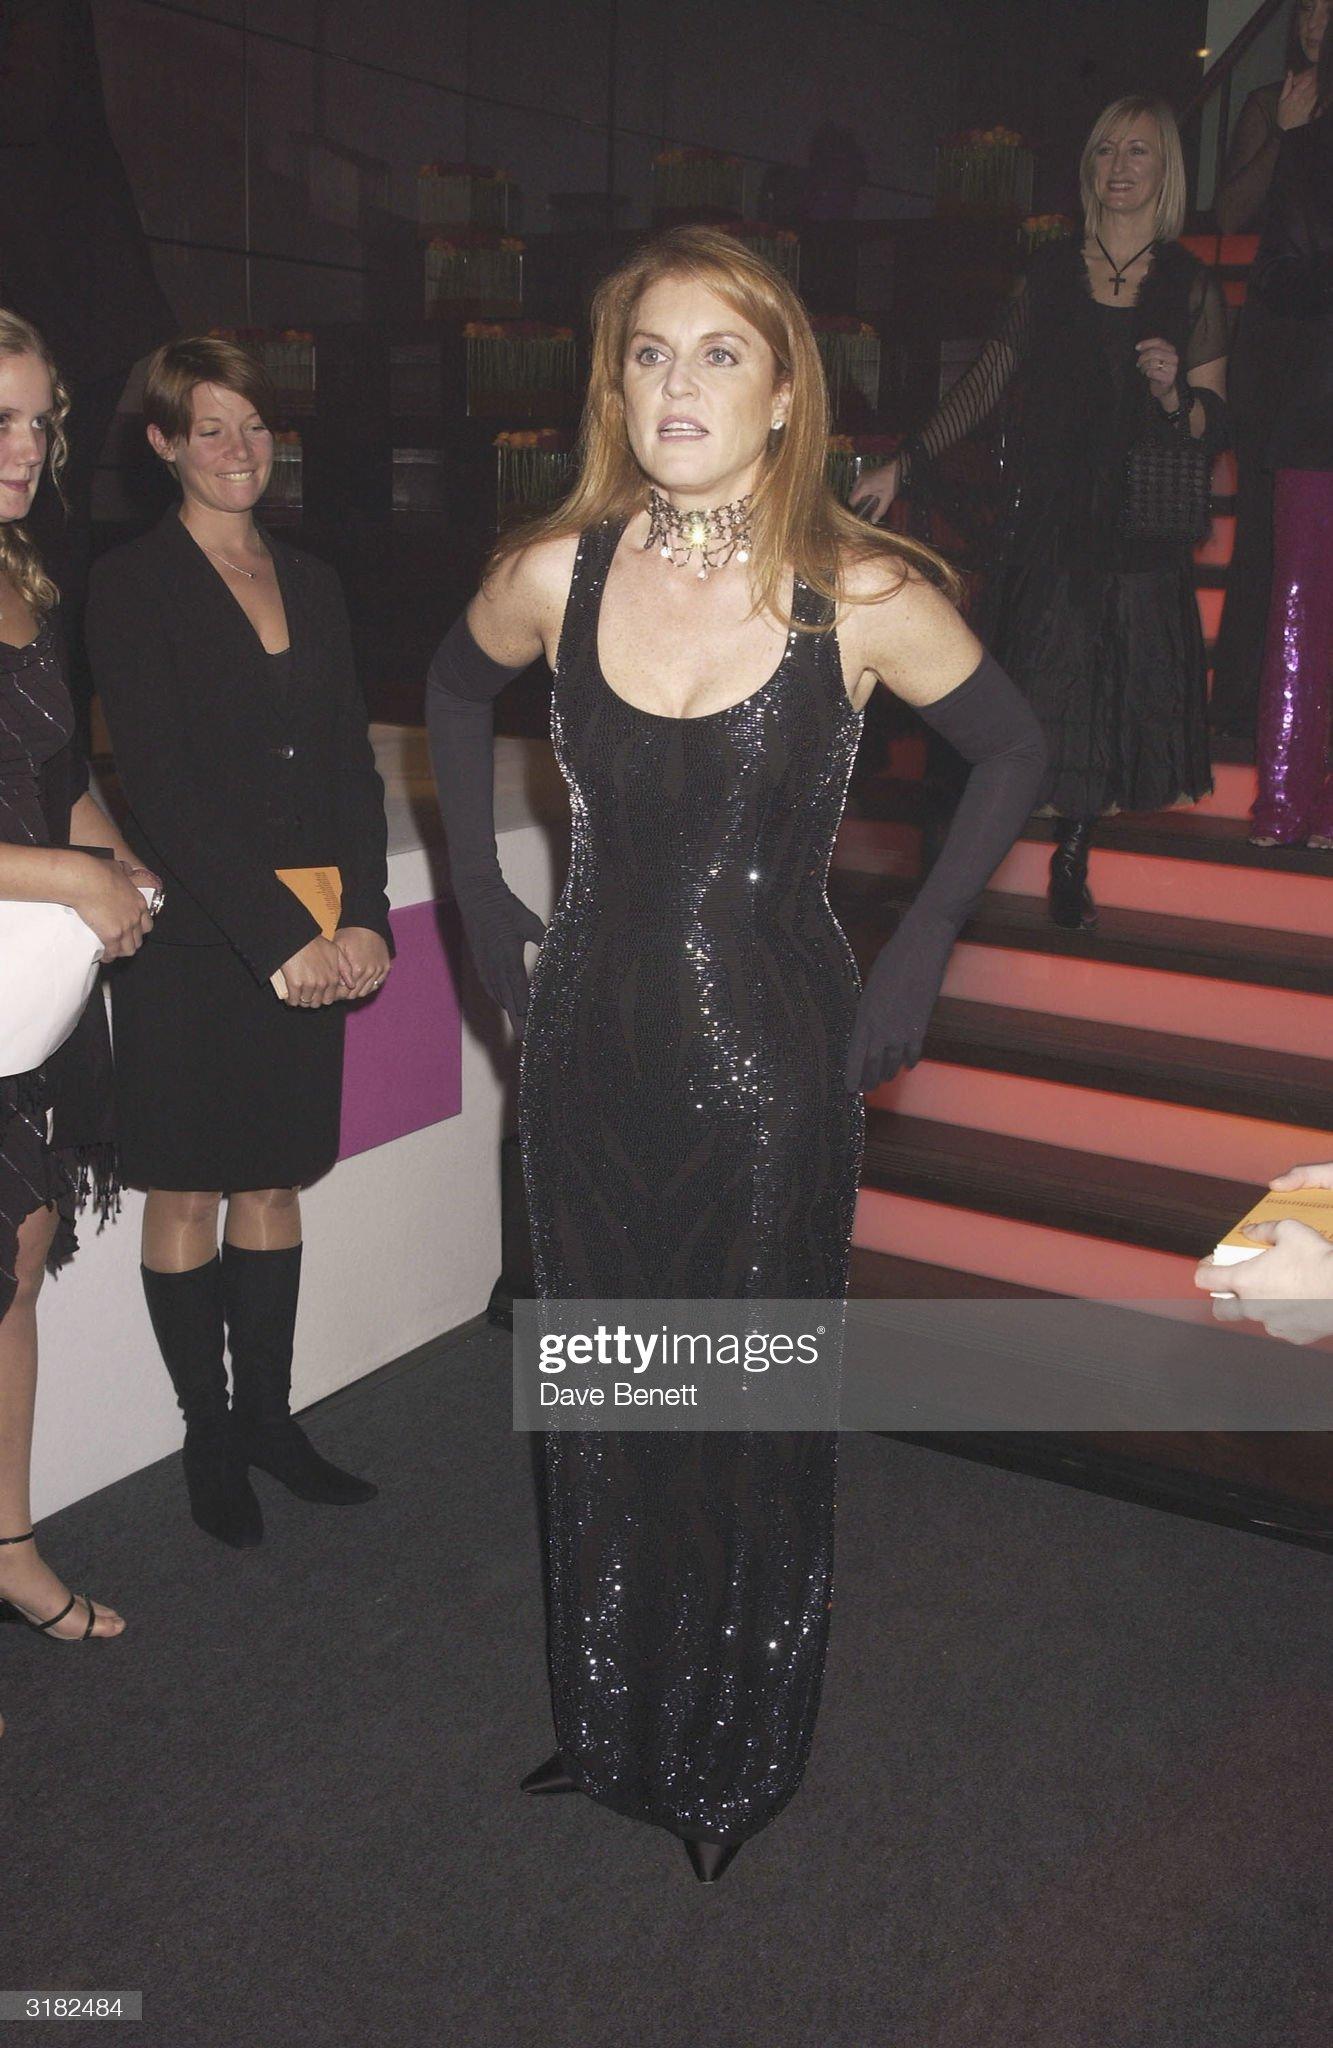 Вечерние наряды Отем пока еще Филлипс и Сары Йоркской The Duchess of York attends a 'Tommy's Charity' party : News Photo